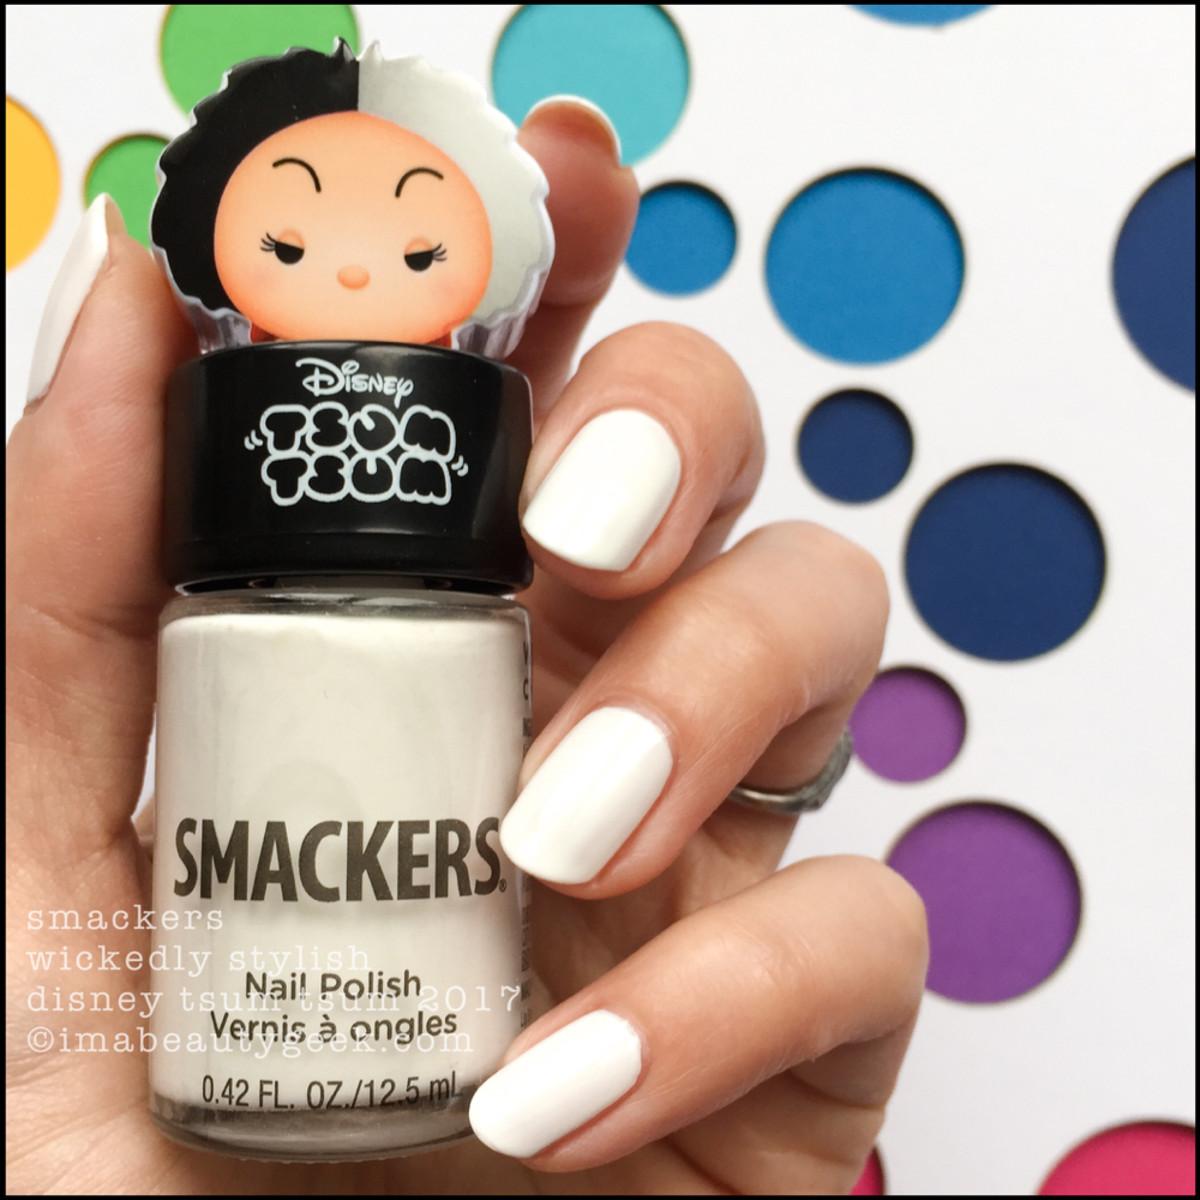 Lip Smackers Tsum Tsum Polish Wickedly Stylish